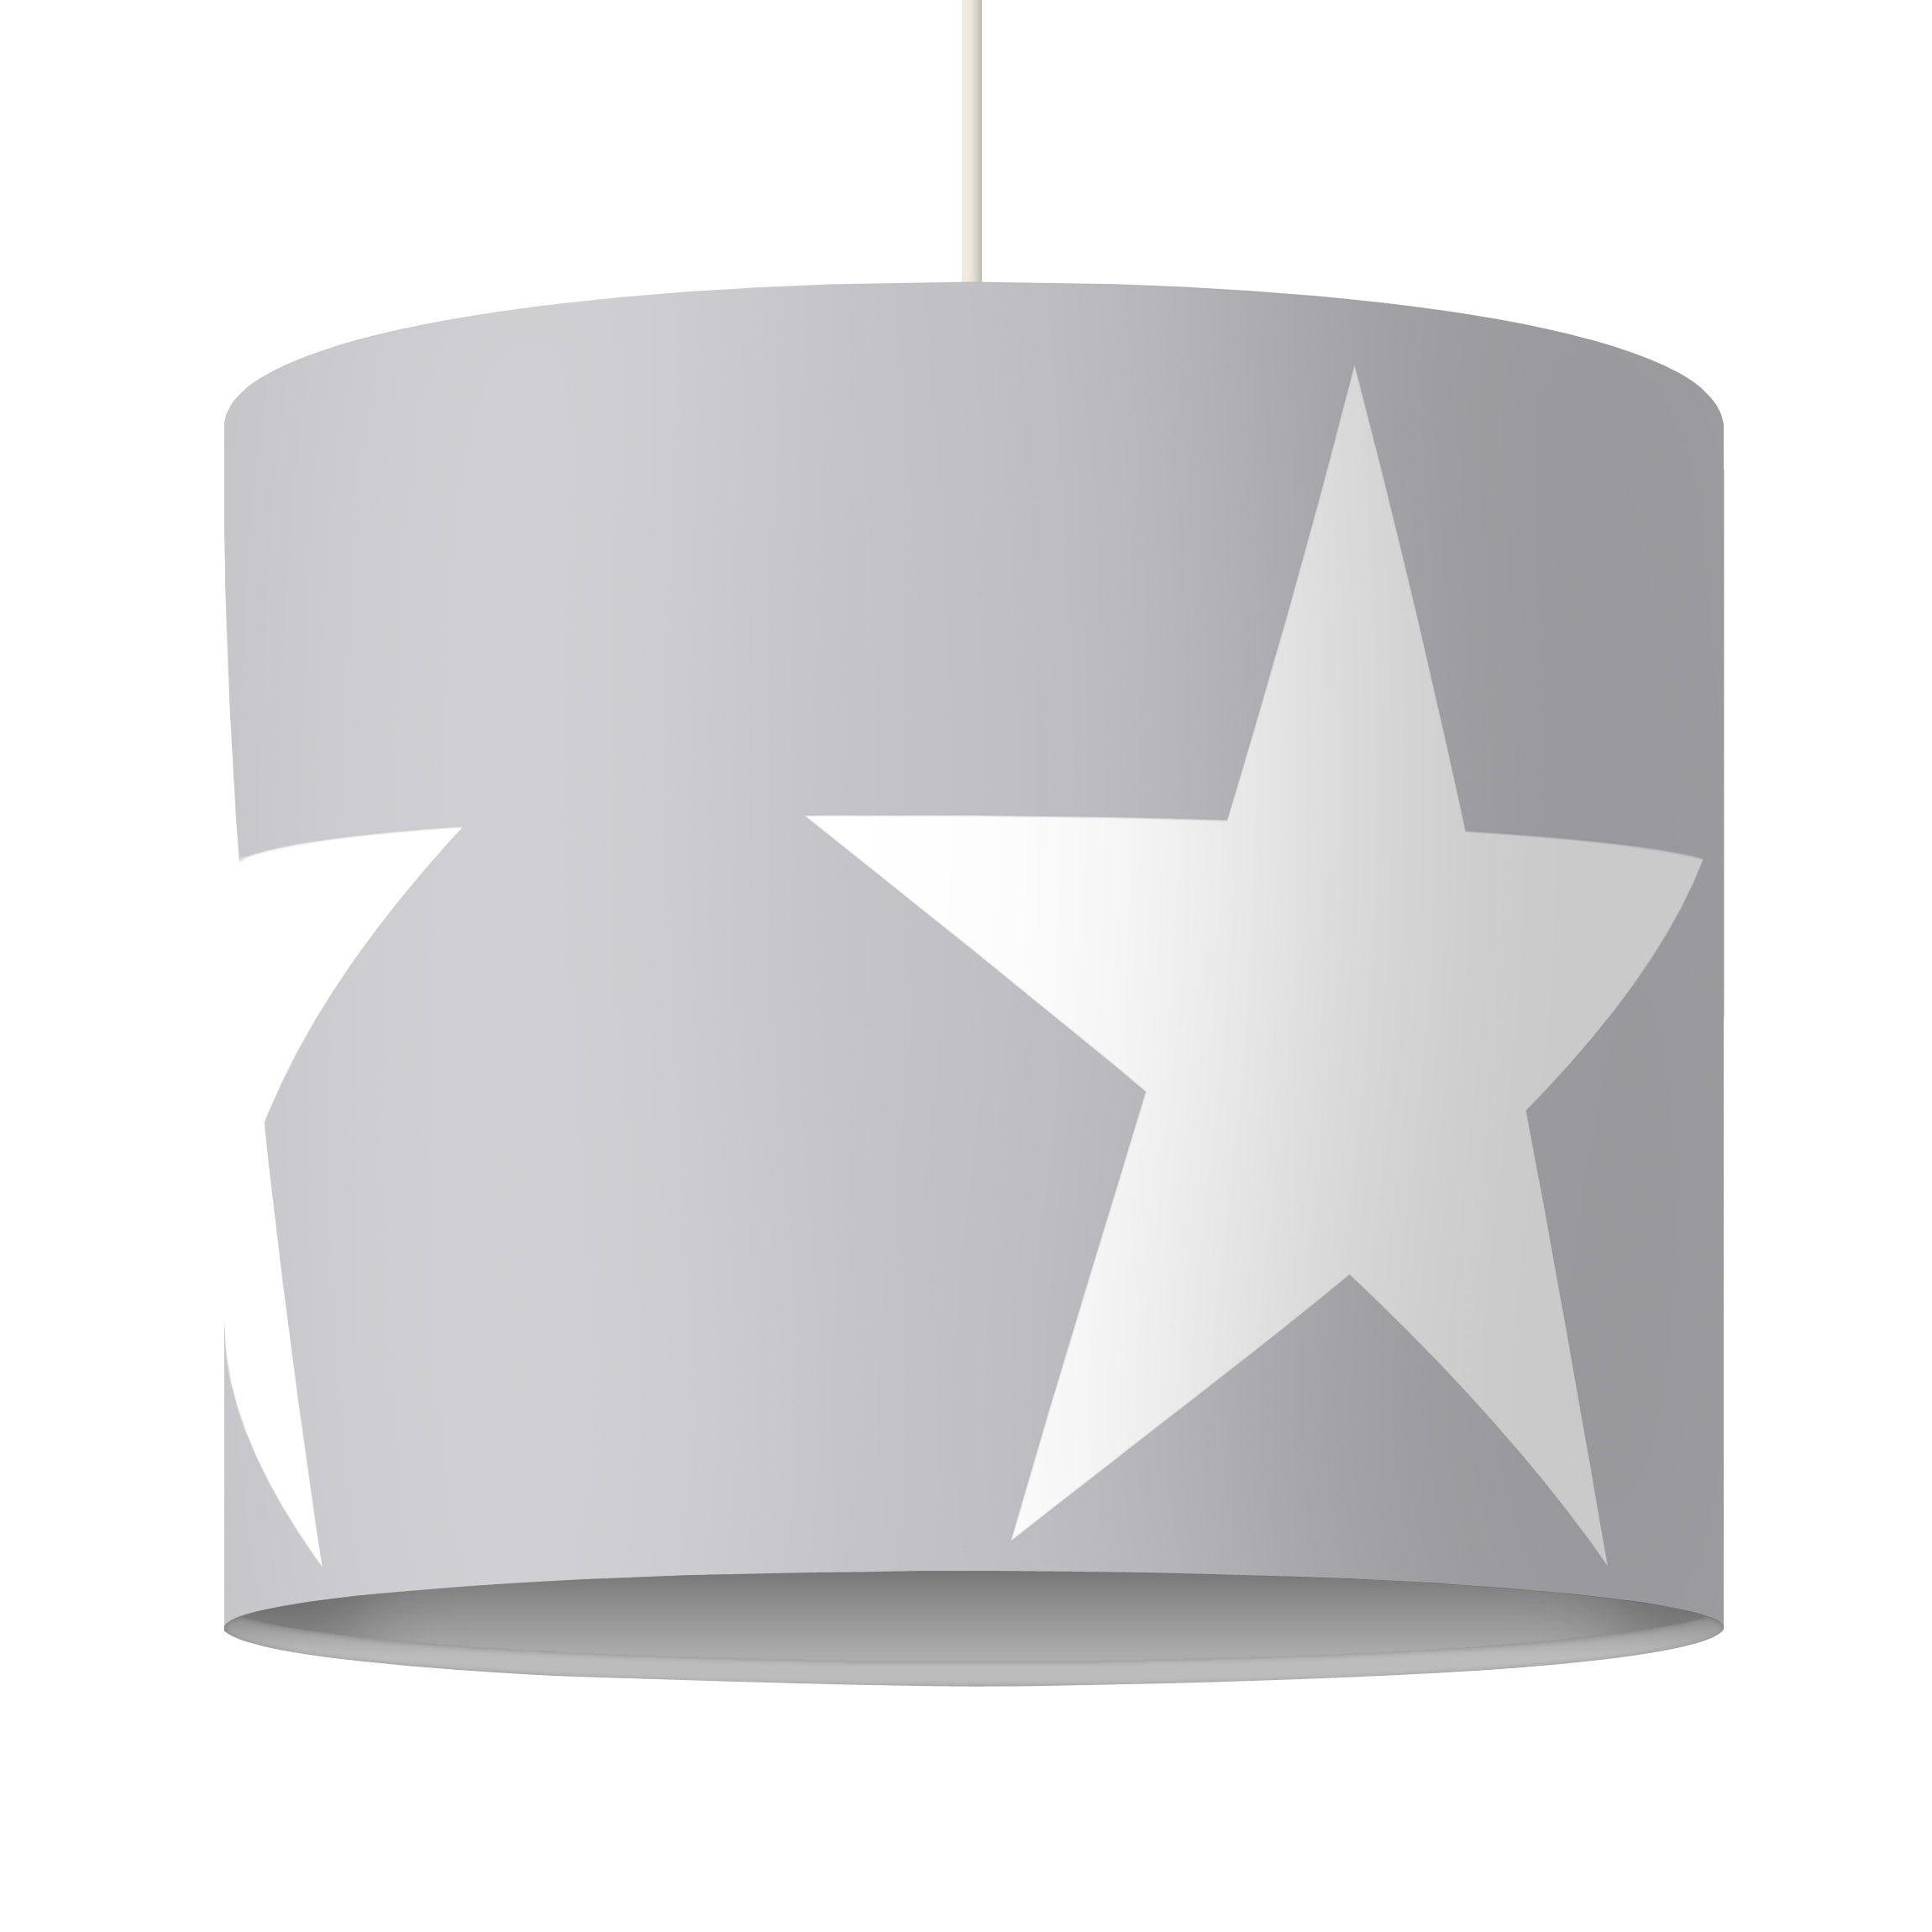 pendelleuchte gro e wei e sterne auf grau lampe lampenschirm grau wei pinterest. Black Bedroom Furniture Sets. Home Design Ideas